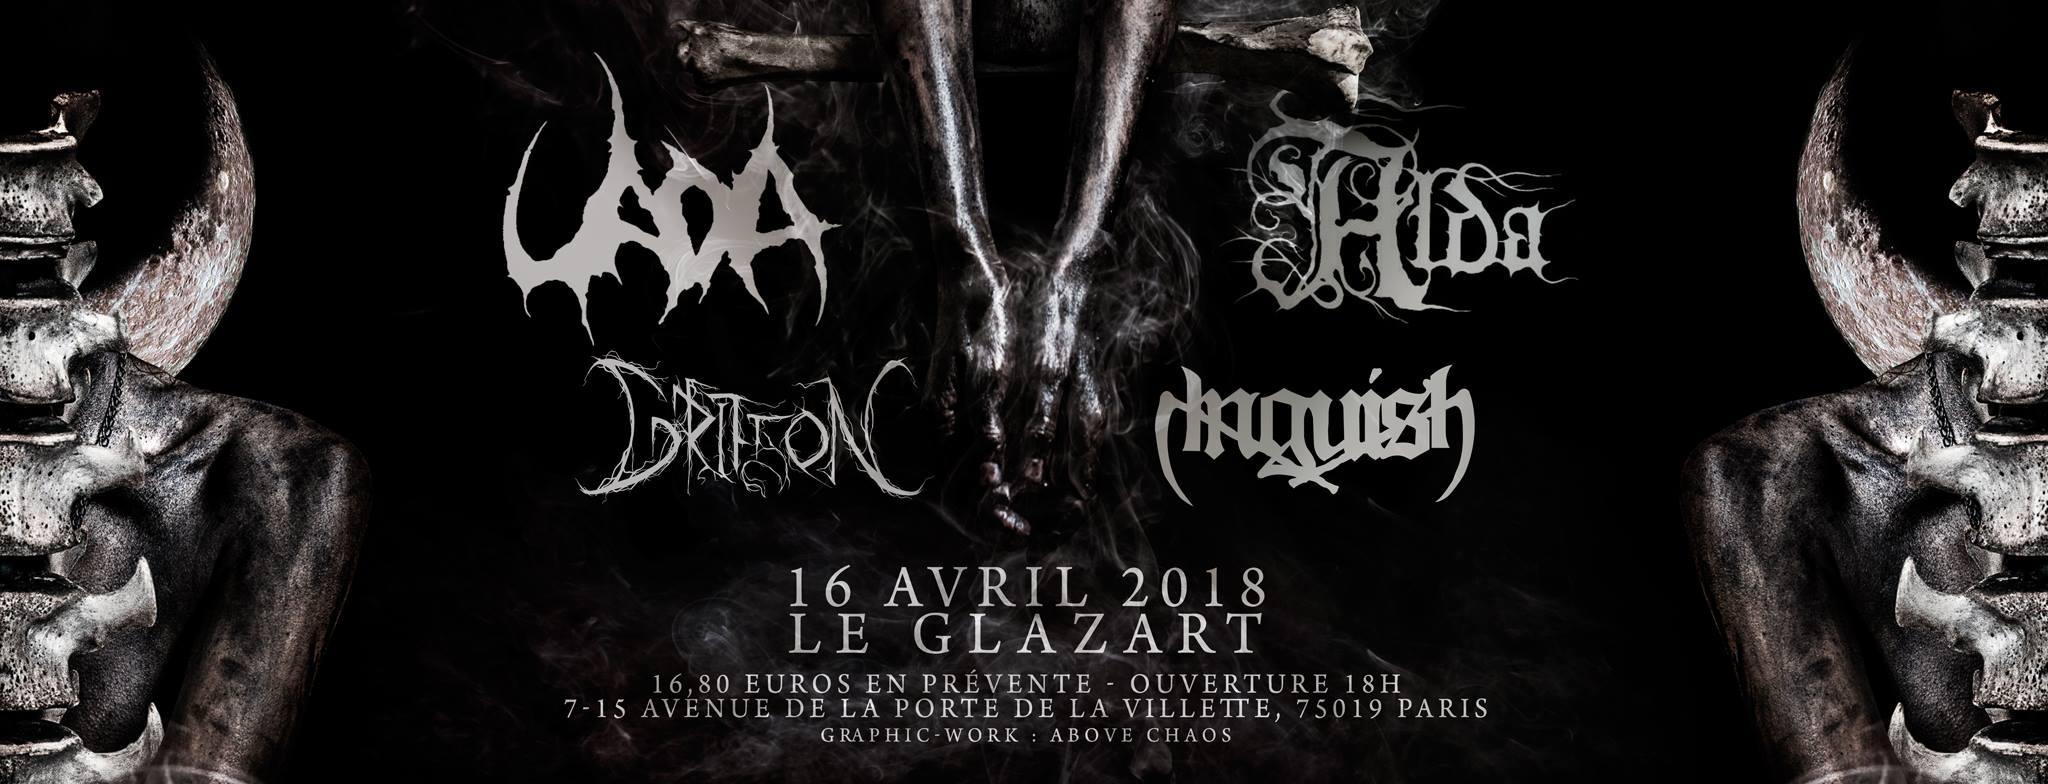 2018-04-16 - Uada + Alda + Griffon + Anguish